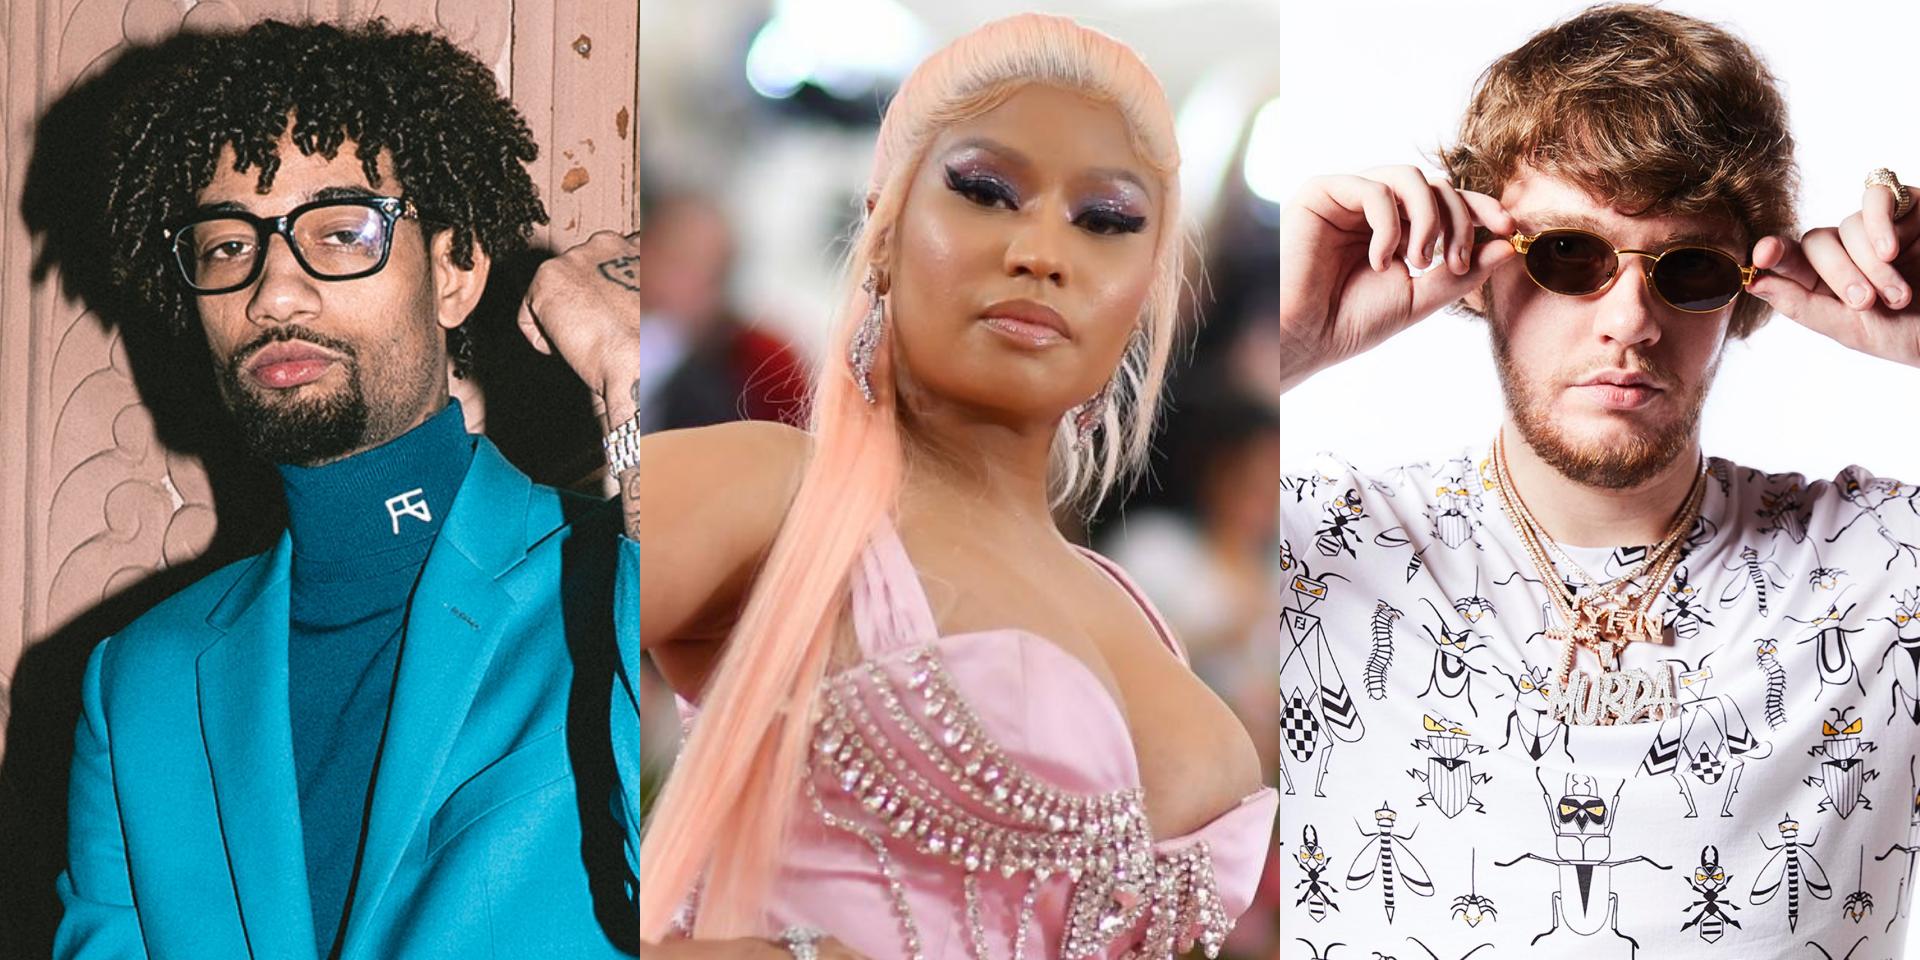 Nicki Minaj, PnB Rock, and Murda Beatz collaborate on new song 'Fendi'